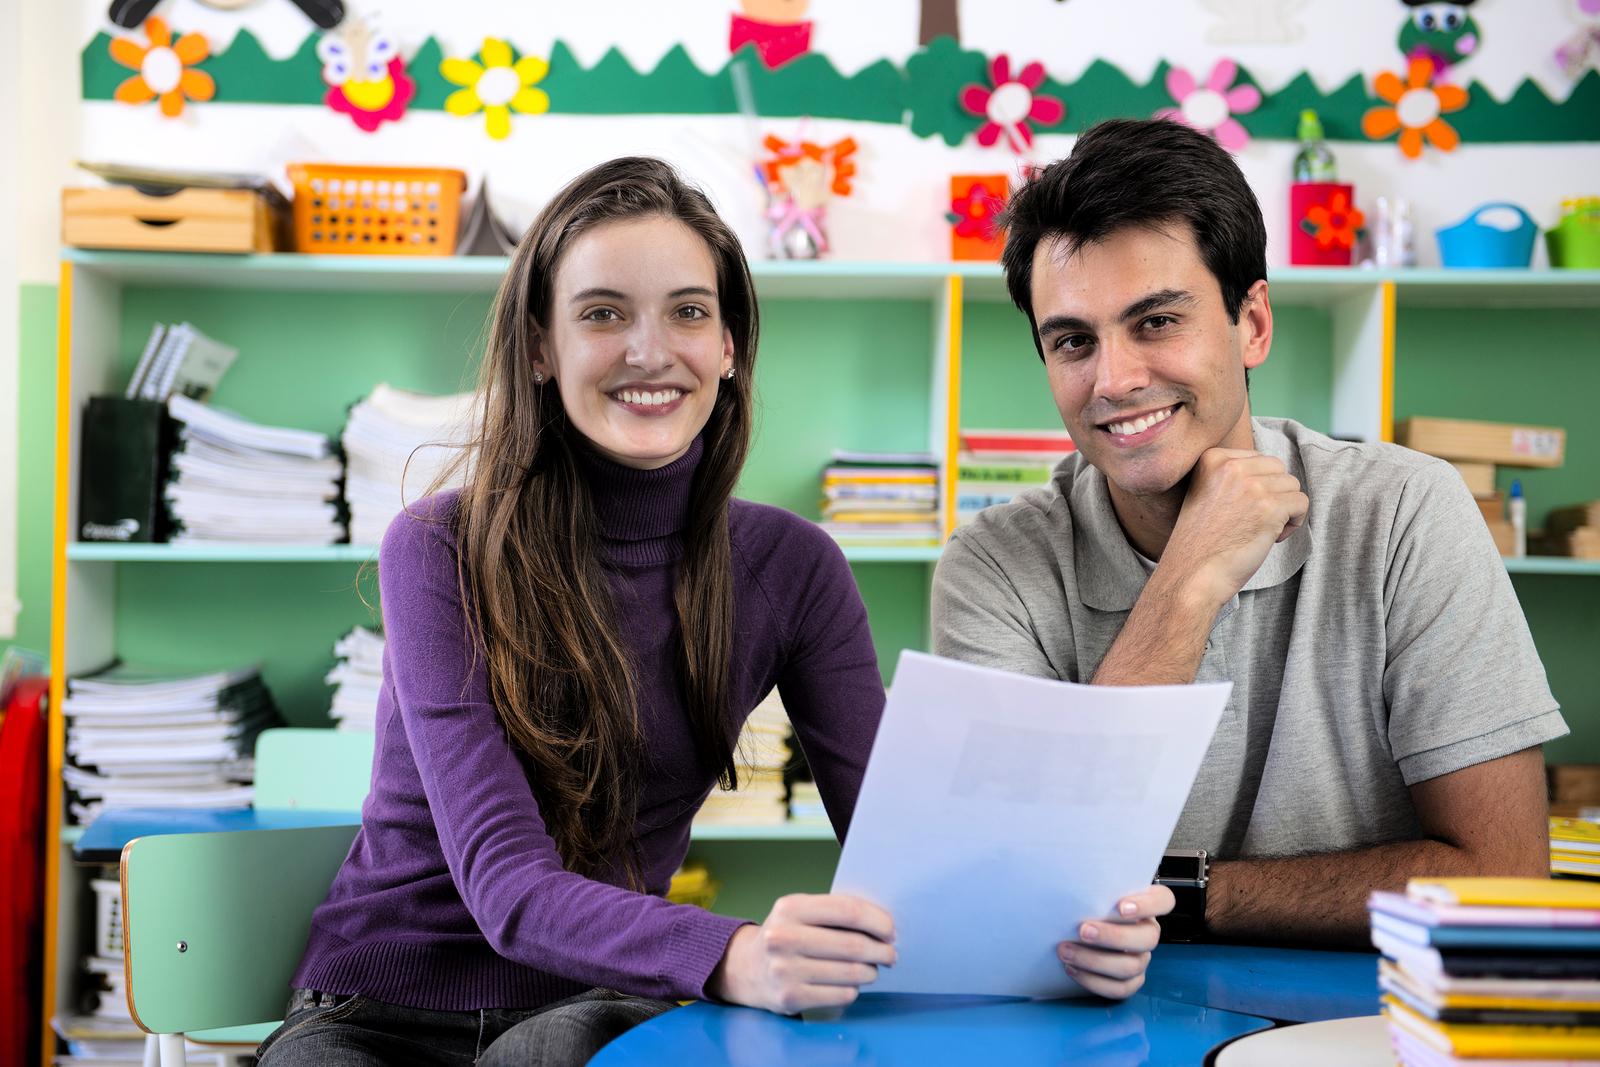 10 Tips to Form an Amazing Parent-Teacher Partnership